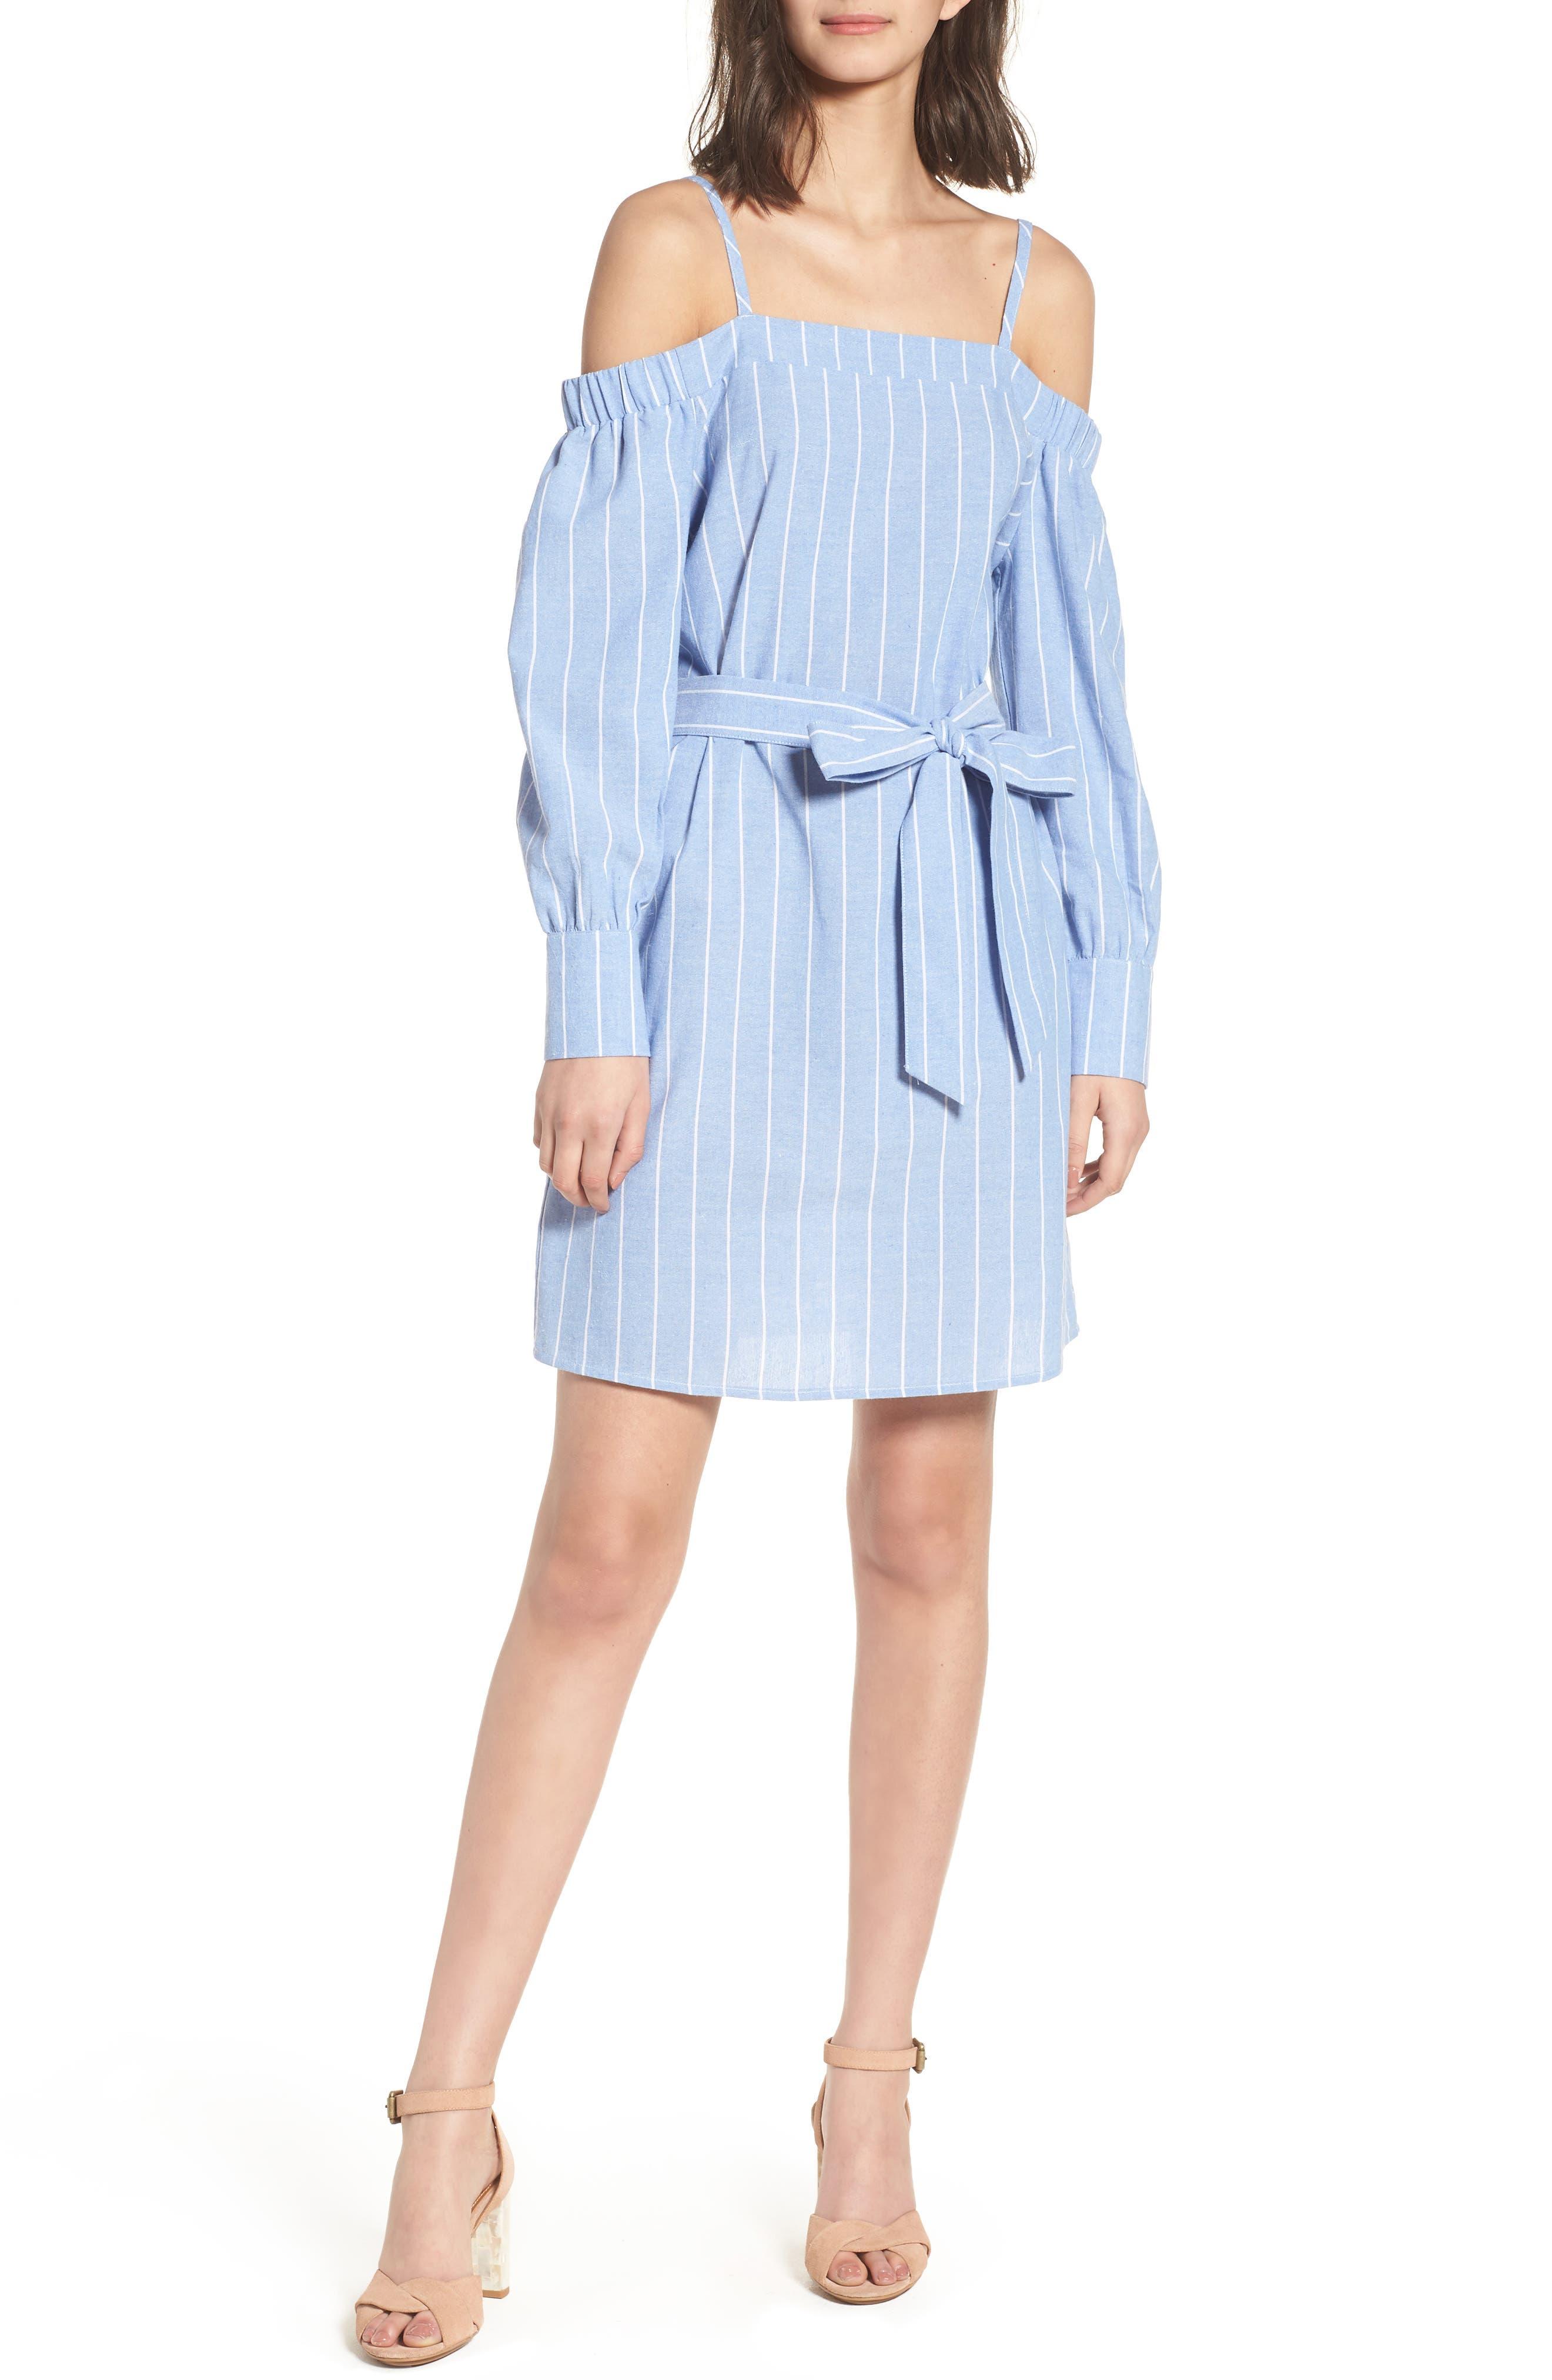 Bishop + Young Chrissy Cold Shoulder Dress,                             Main thumbnail 1, color,                             Blue White Stripe